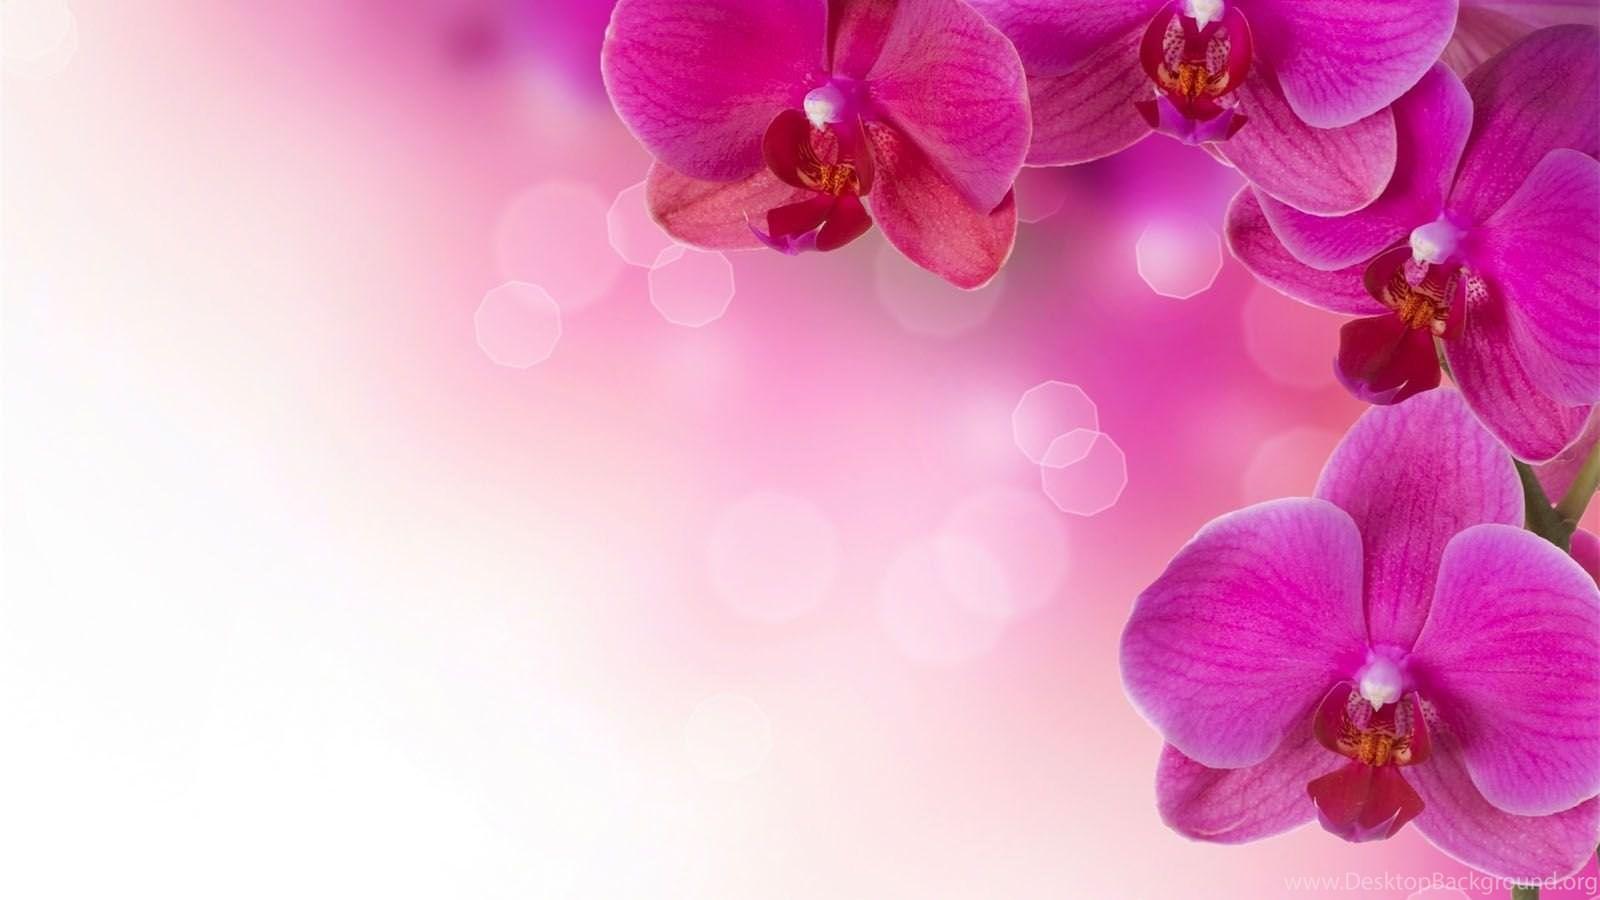 Pink flower background 1377212 - Popular